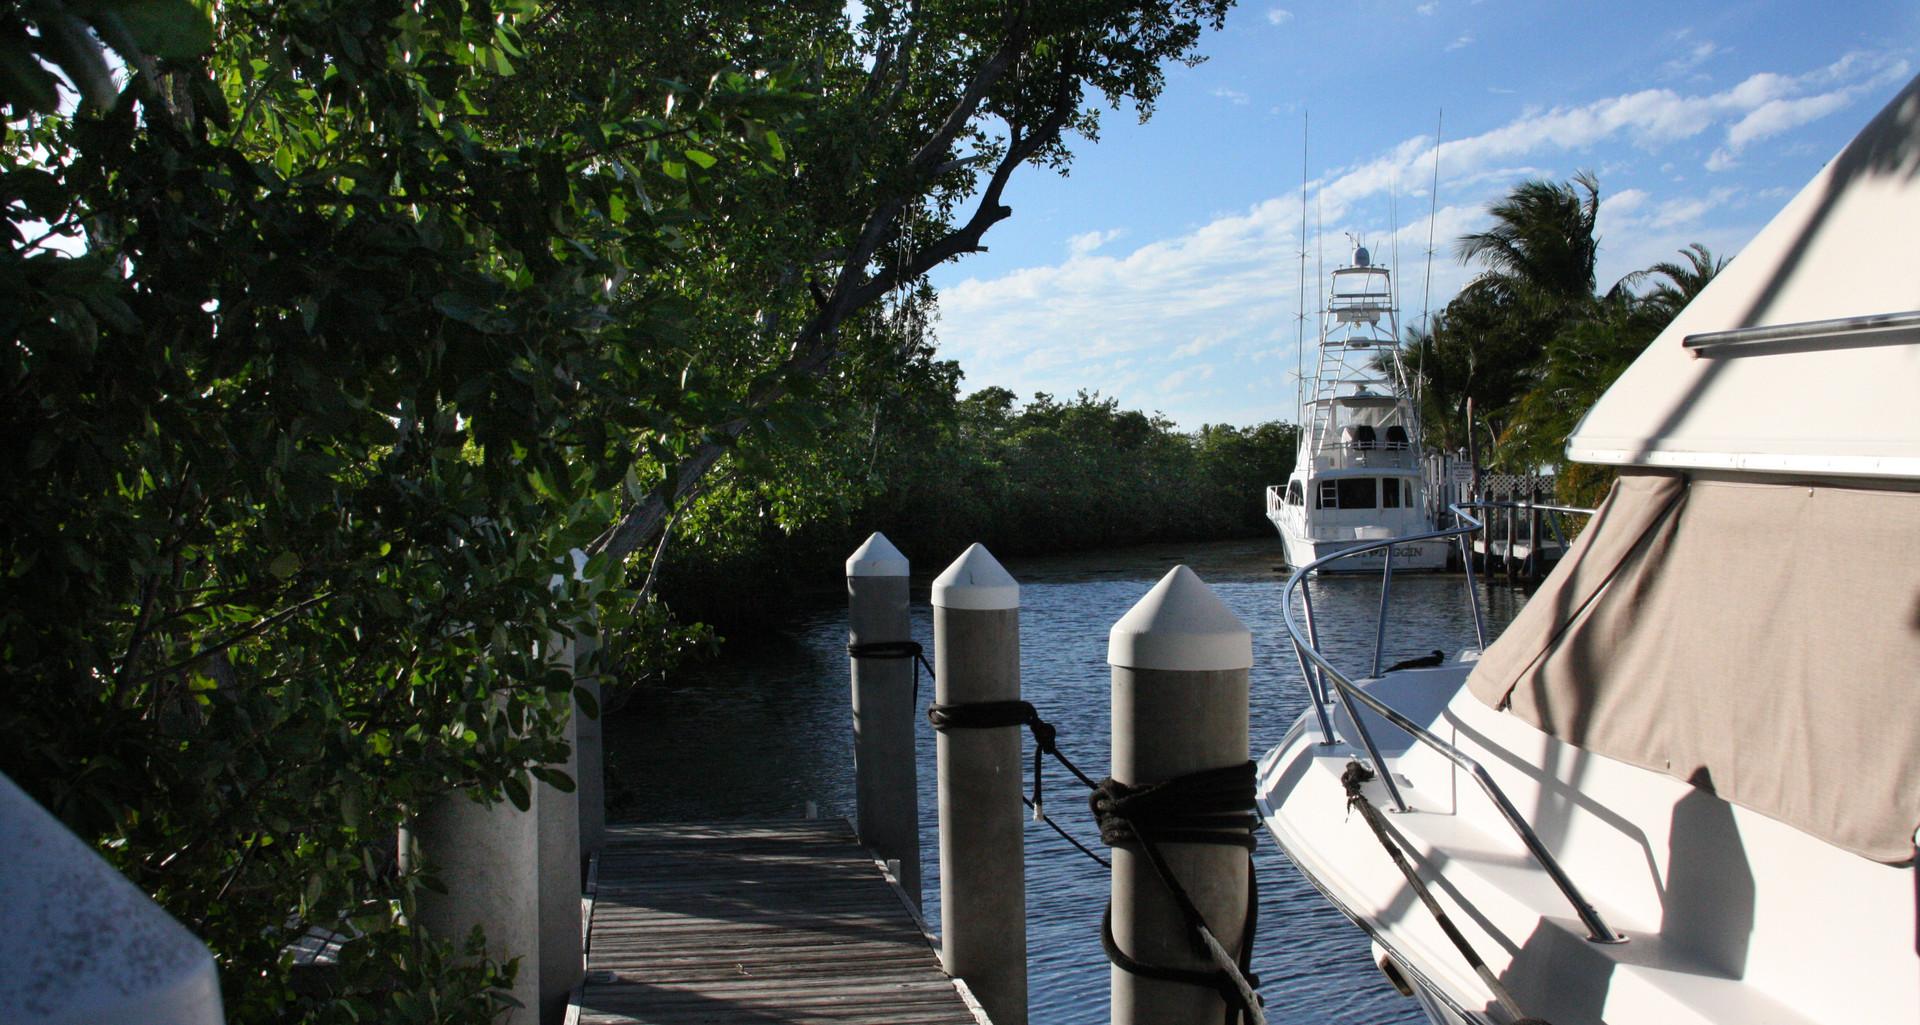 Coconut_Cay_canal.jpg